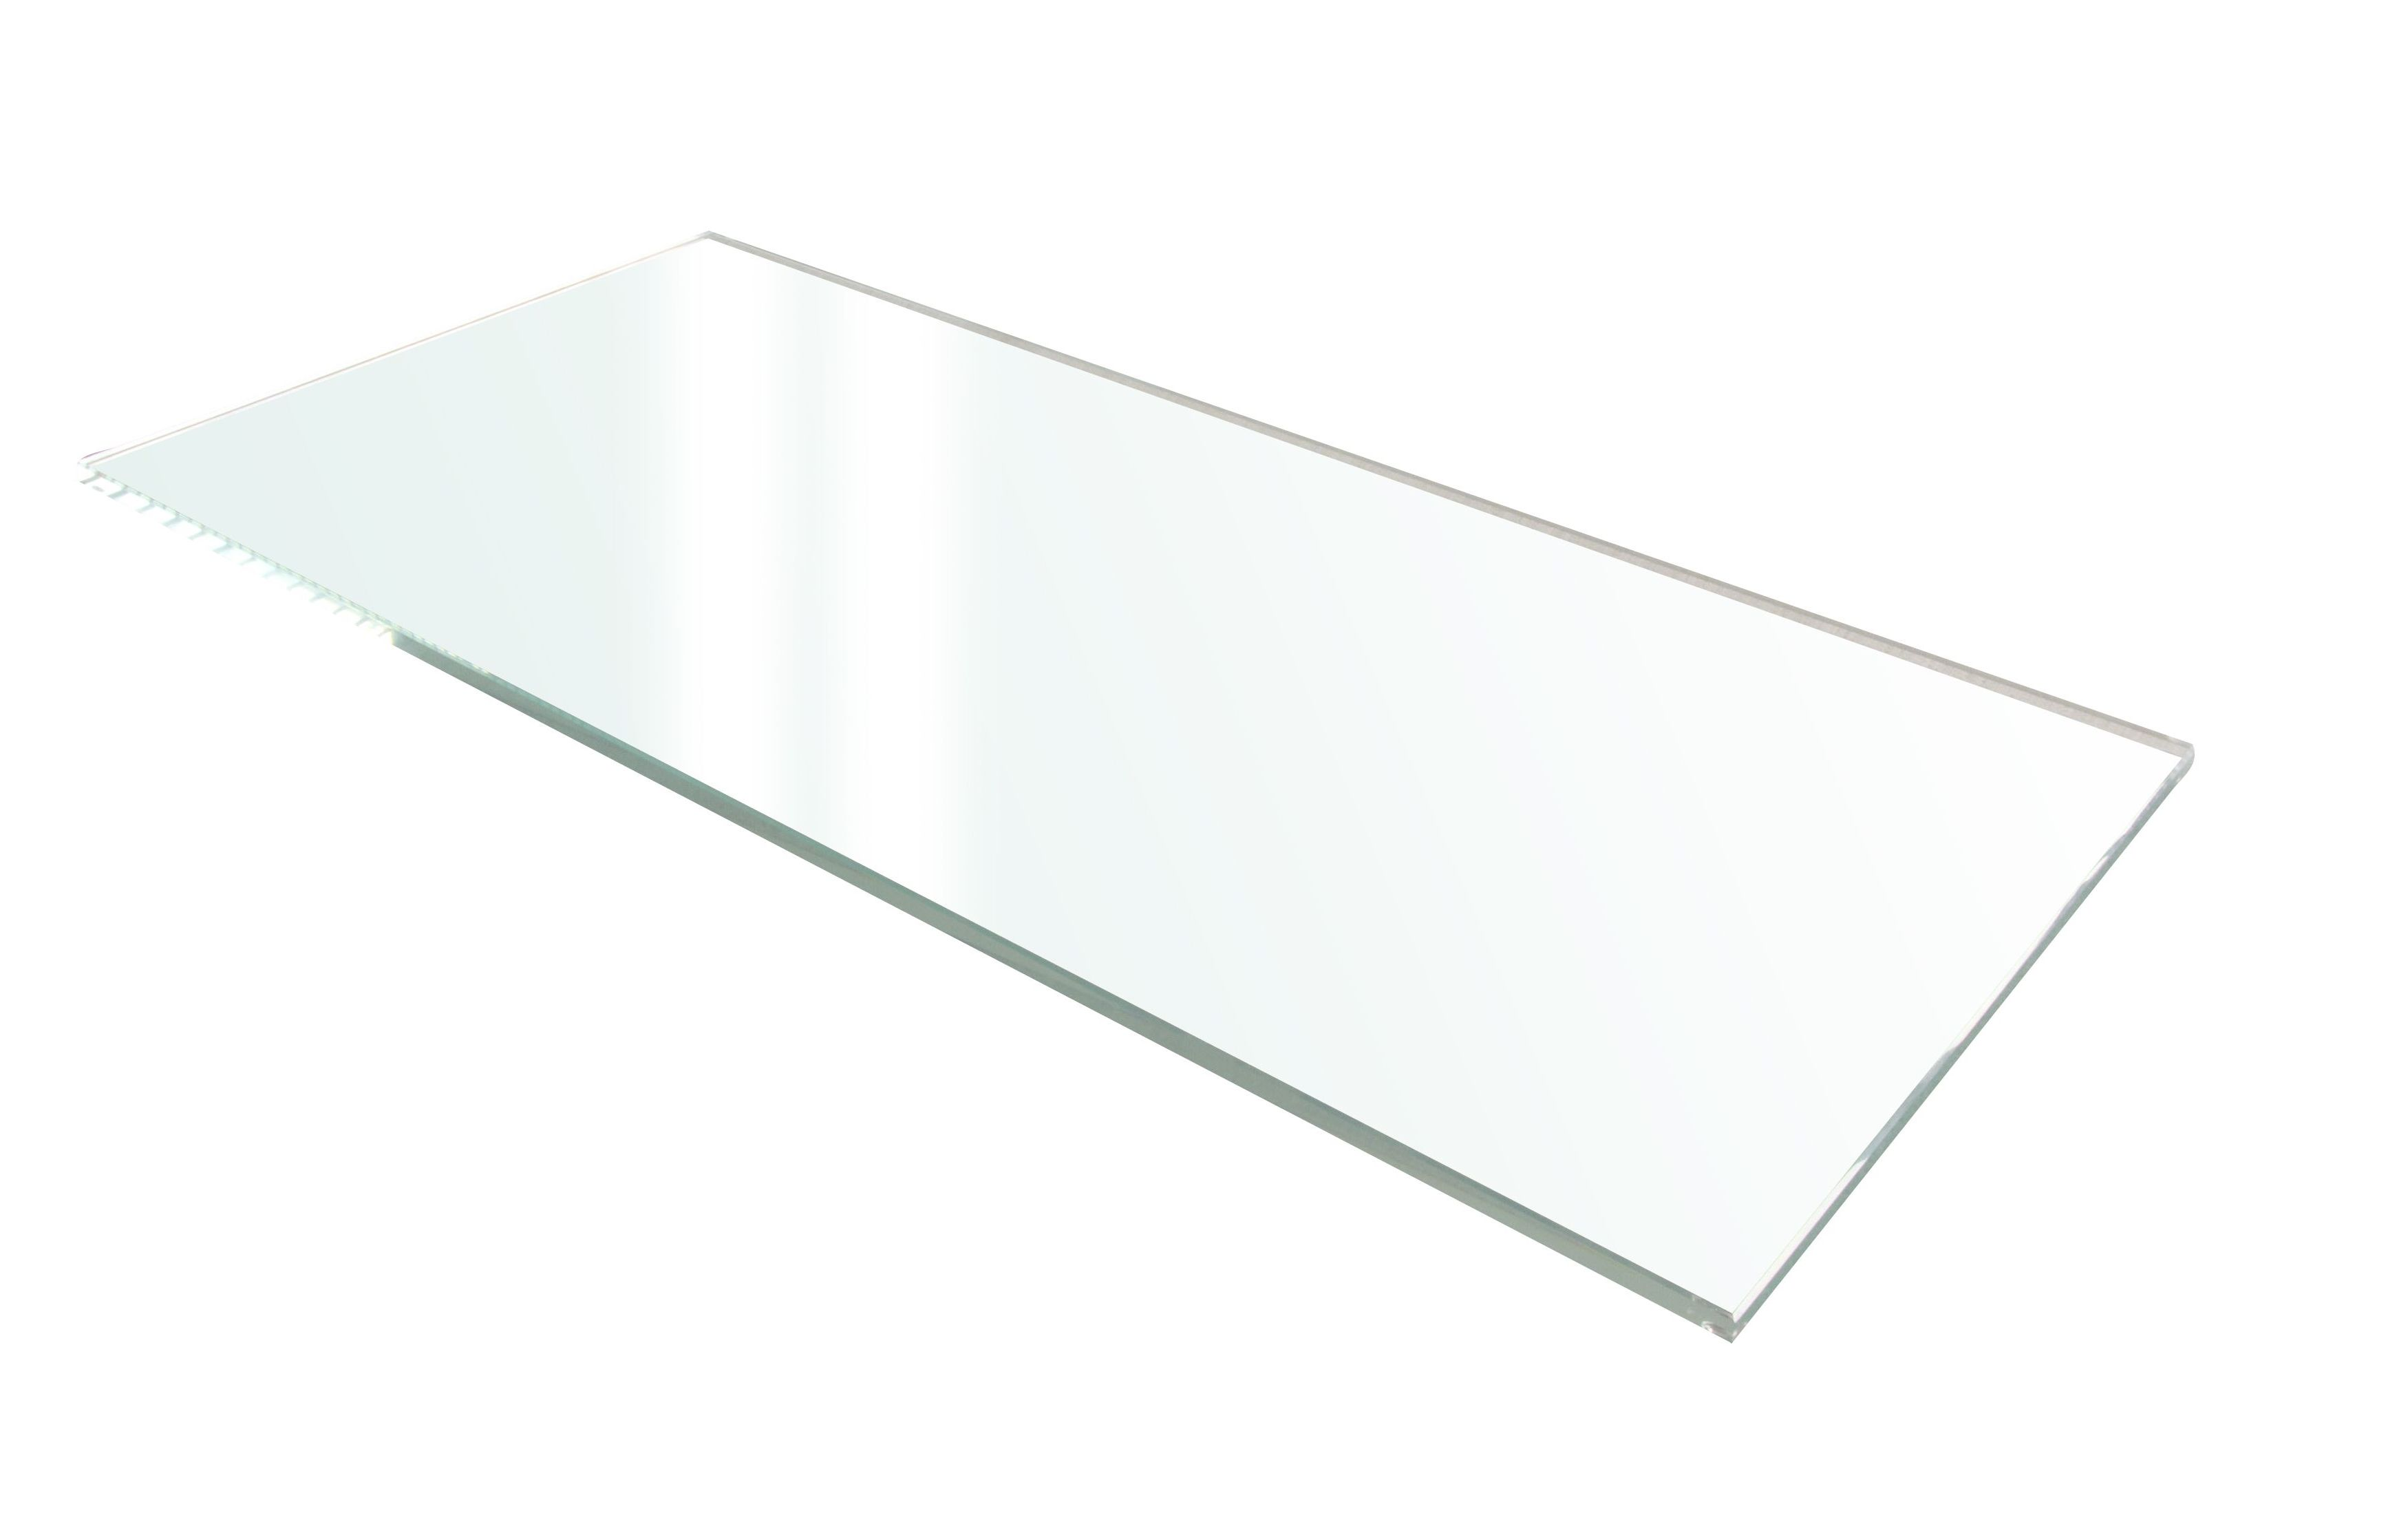 Tvrzené bílé sklo GN 1/2 - Verlo